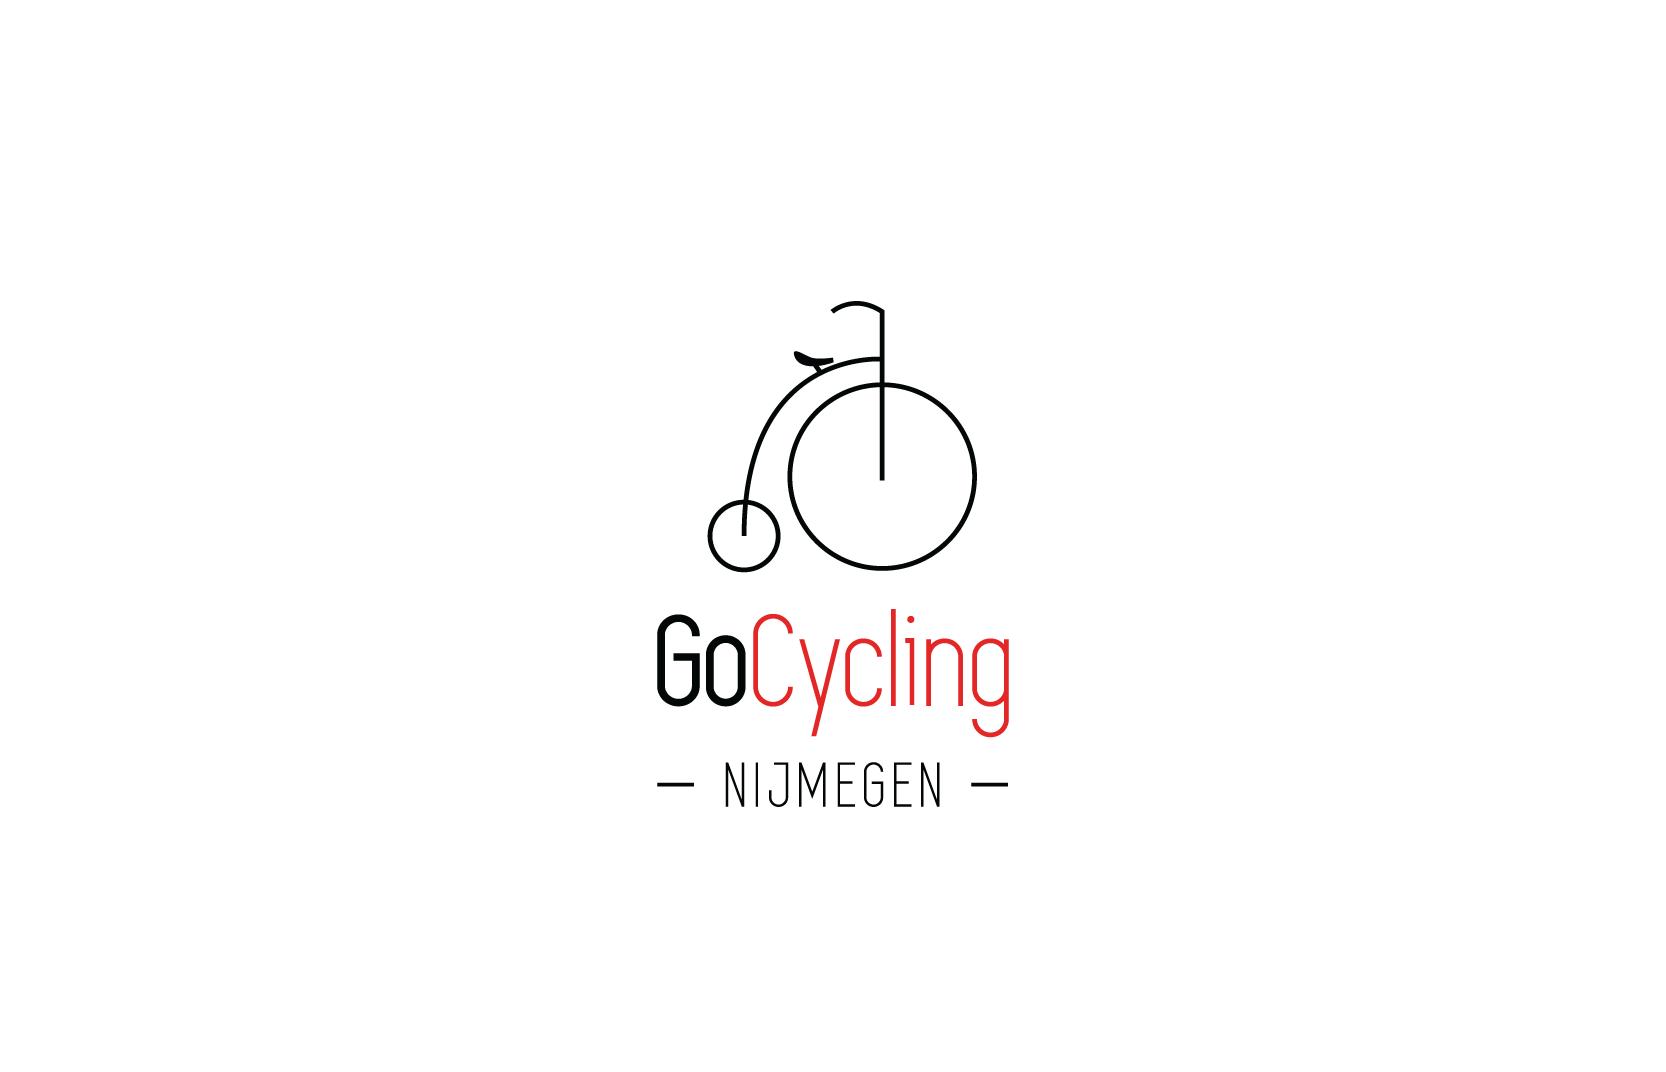 logo_gocycling_logo2